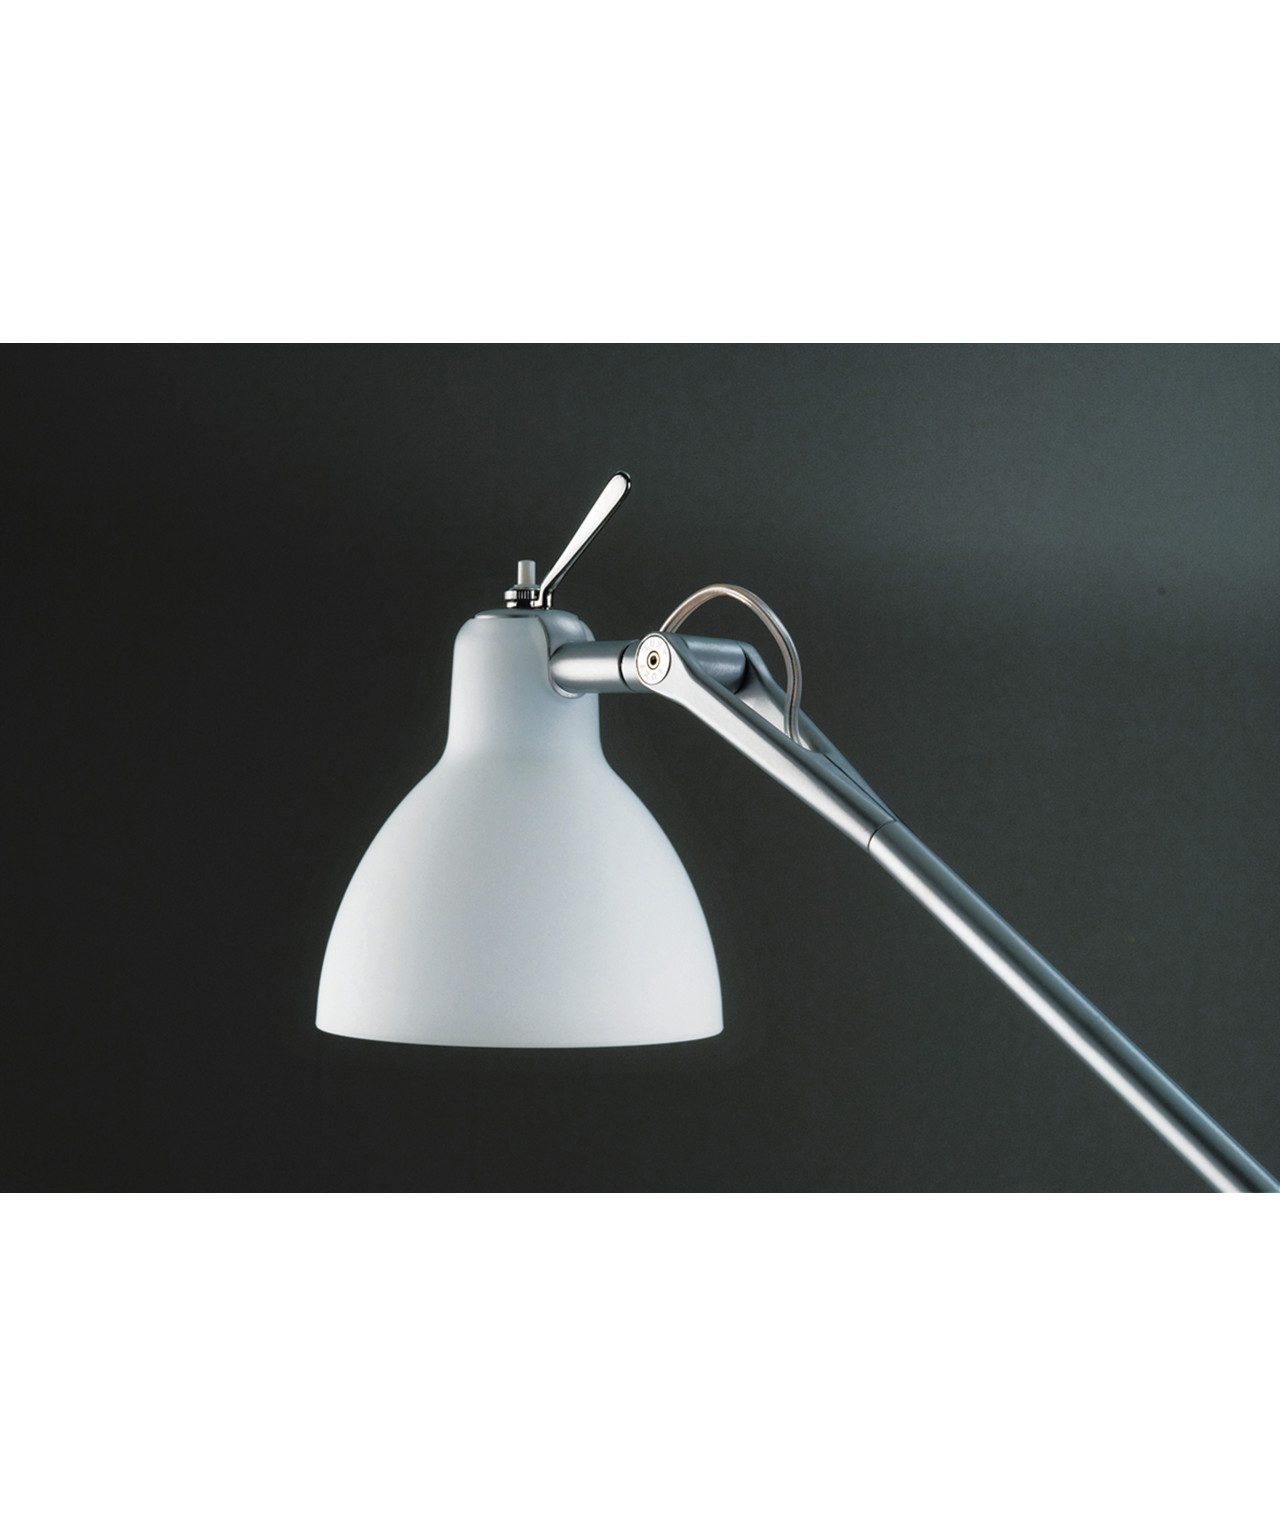 Image of Luxy W2 Væglampe Hvid/Blank Hvid - Rotaliana (7607998)